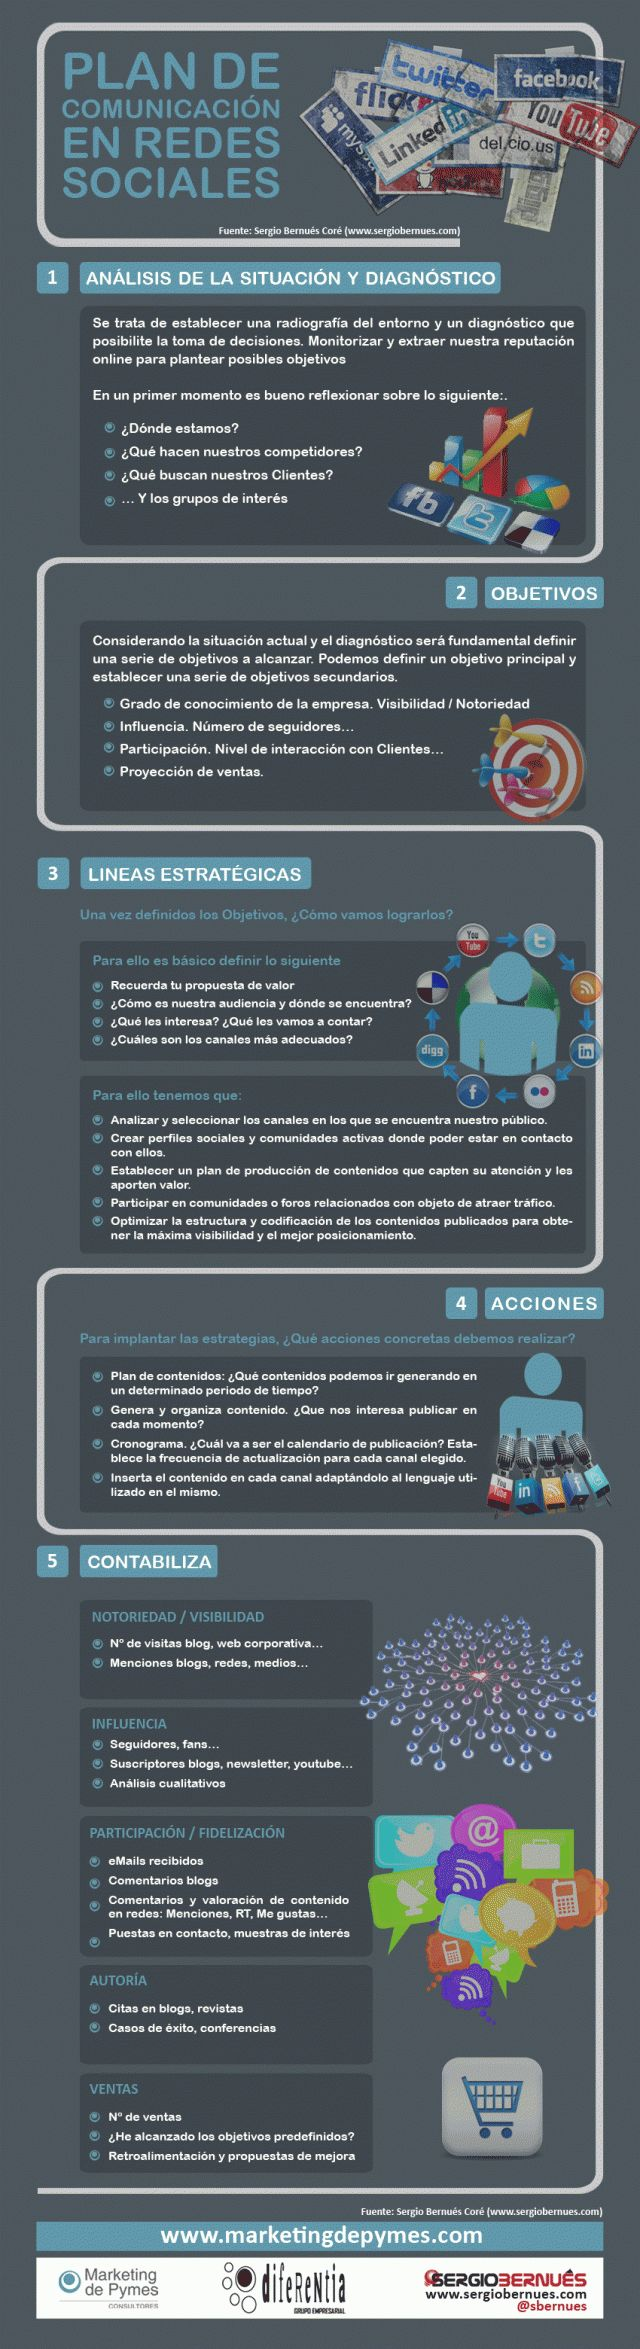 Plan de comunicación en redes sociales